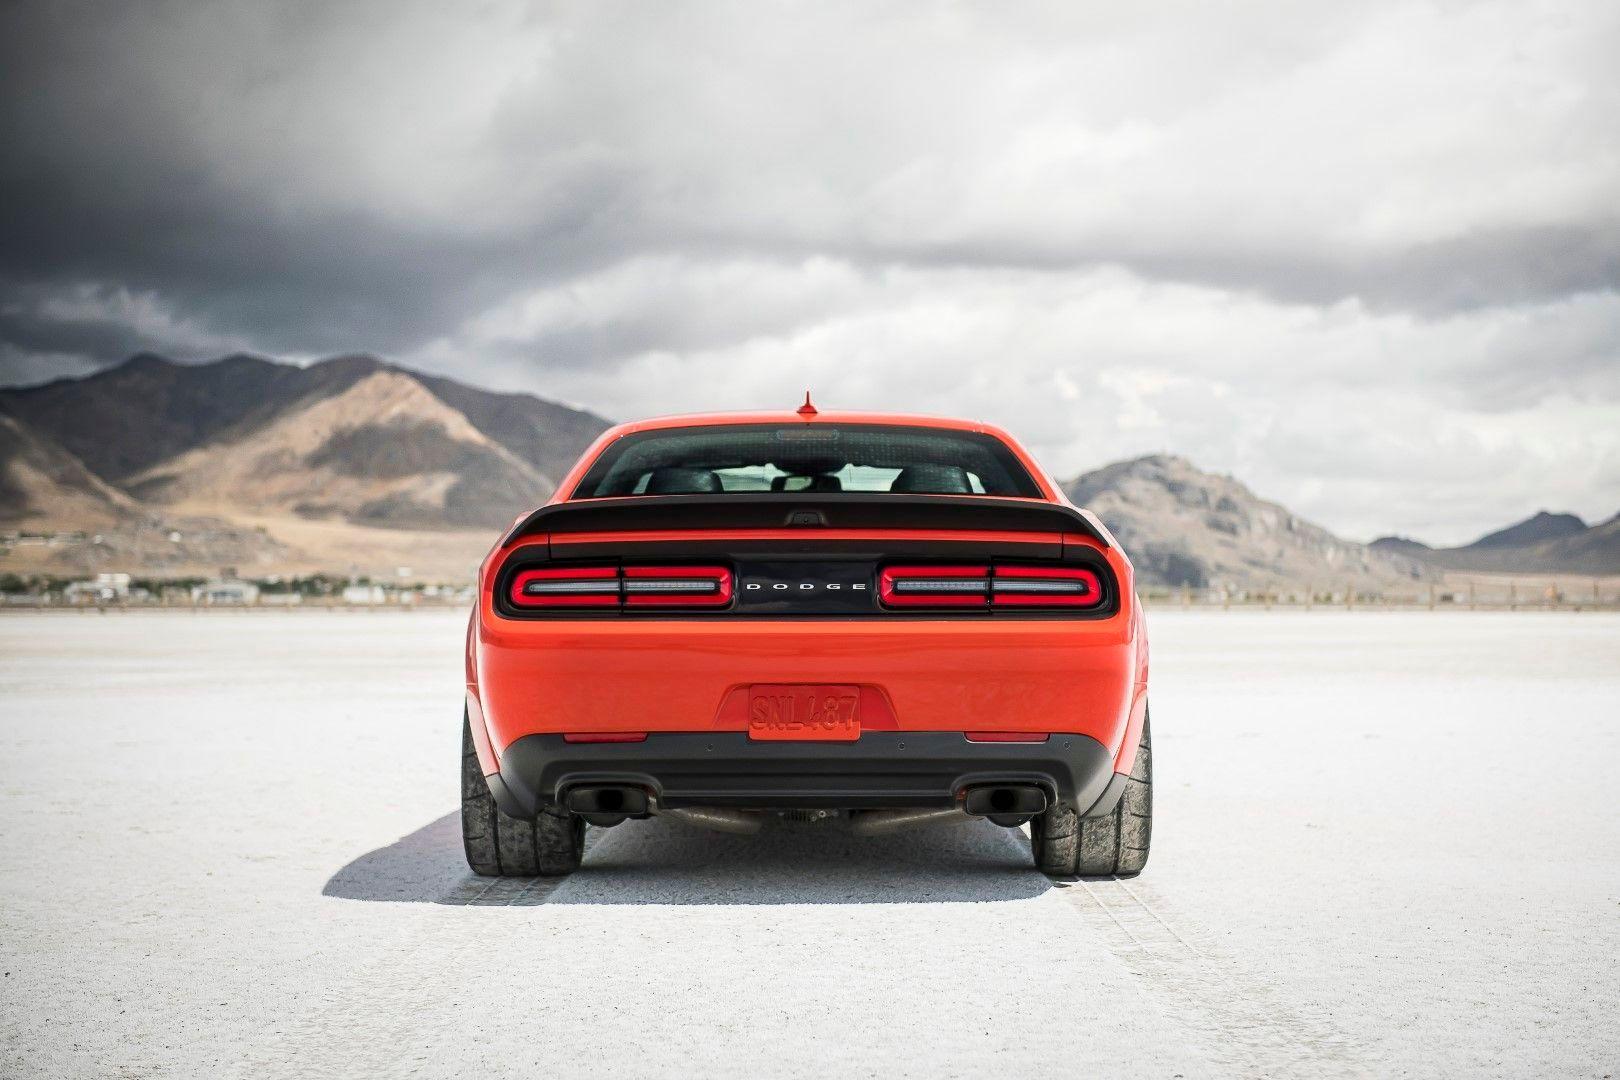 2021 Dodge Challenger Srt In 2021 Dodge Challenger Srt Dodge Challenger Challenger Srt